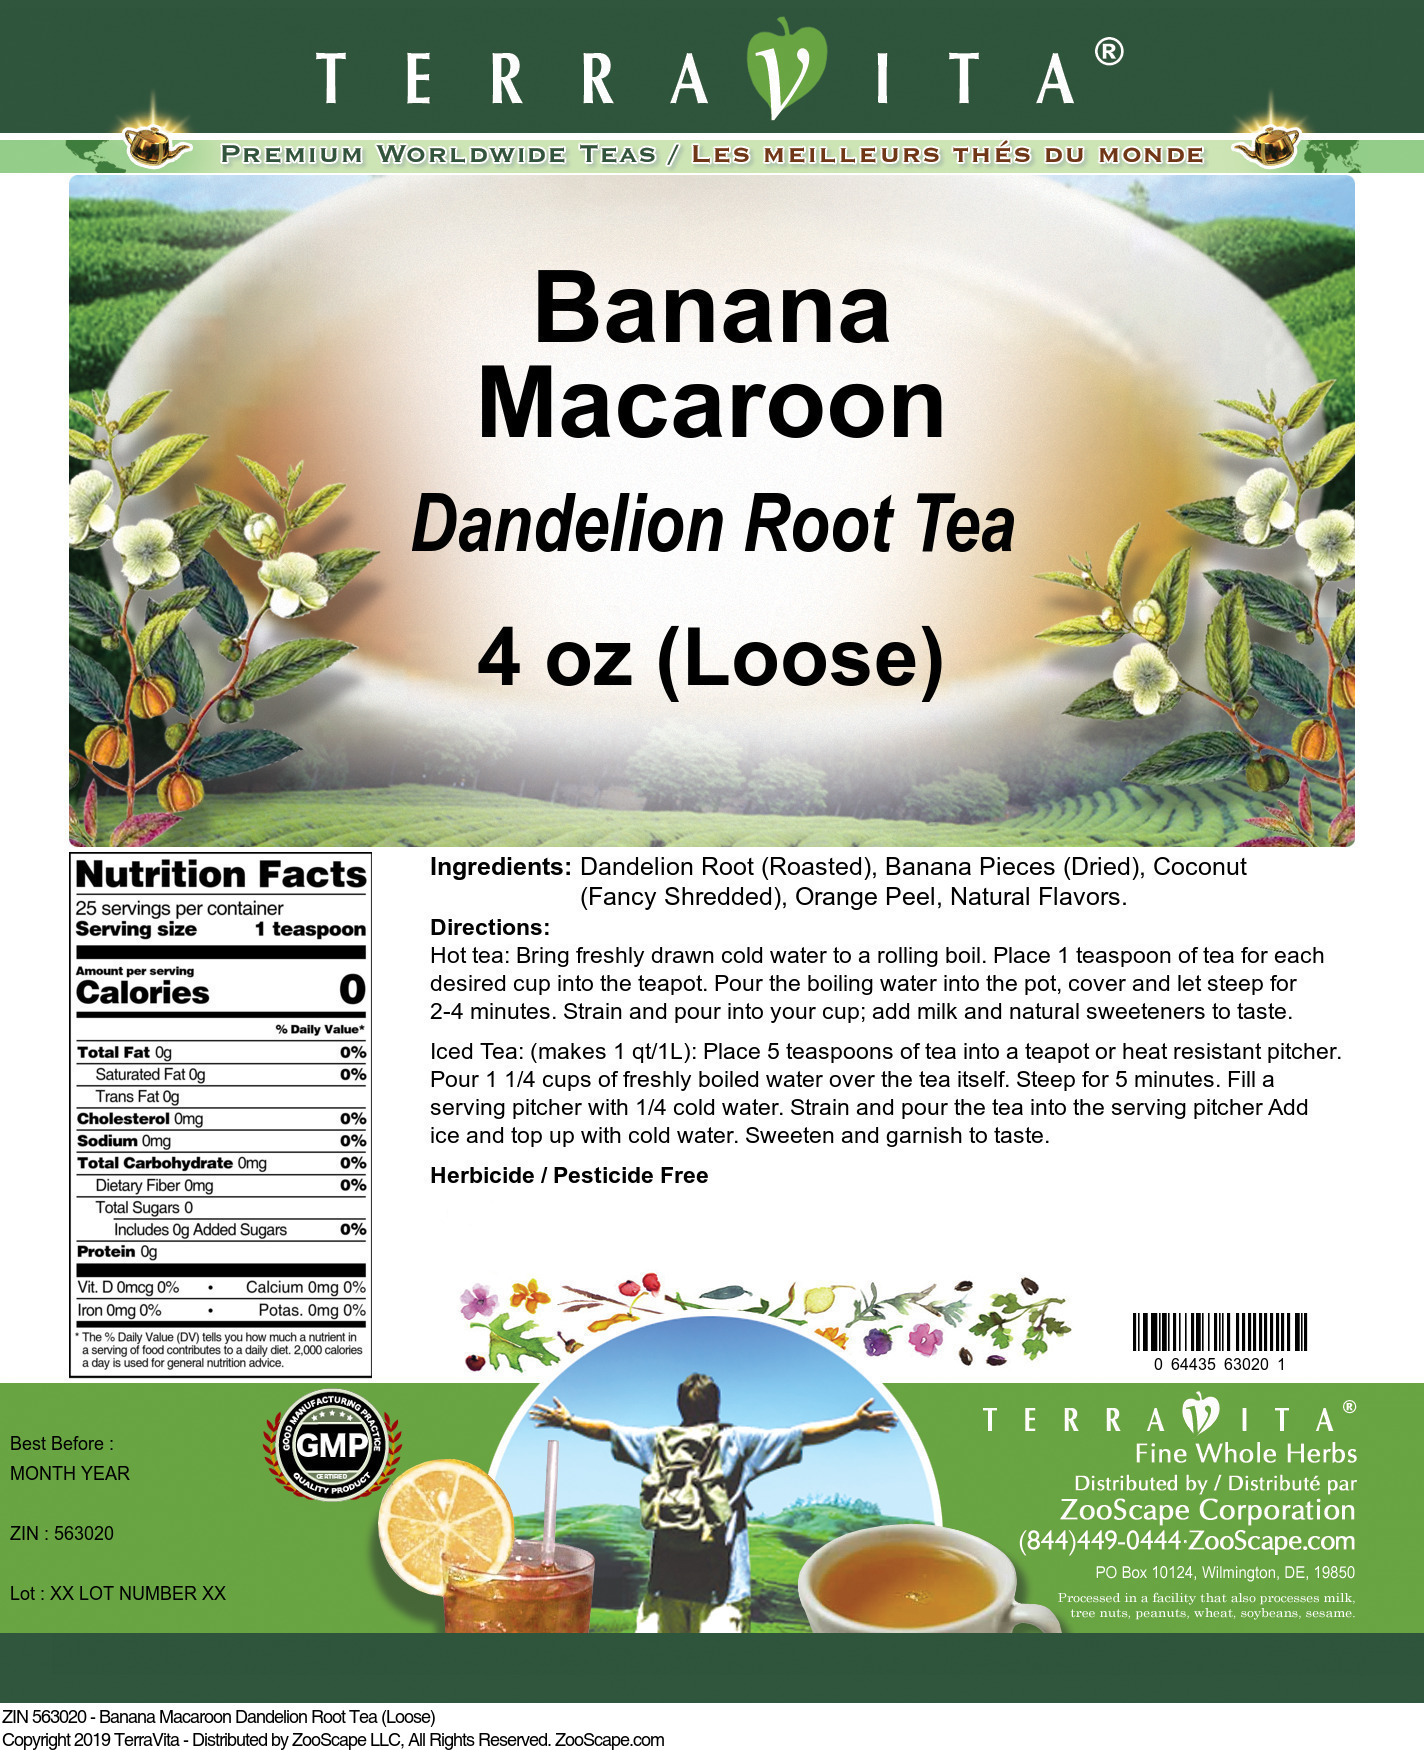 Banana Macaroon Dandelion Root Tea (Loose)